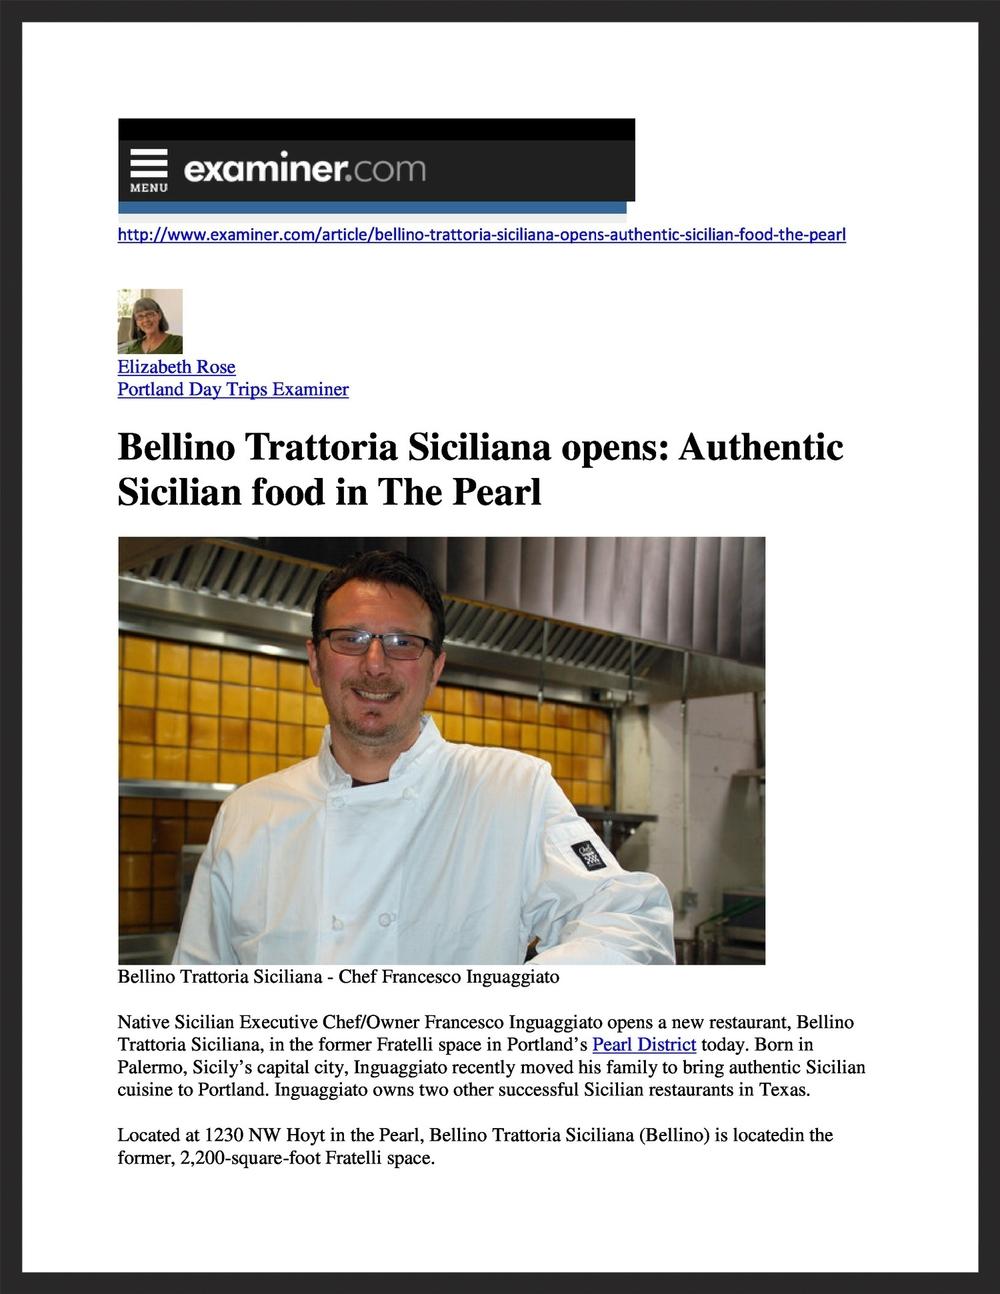 BELLINO TRATTORIA SICILIANA  Examiner.com  04.14.2015